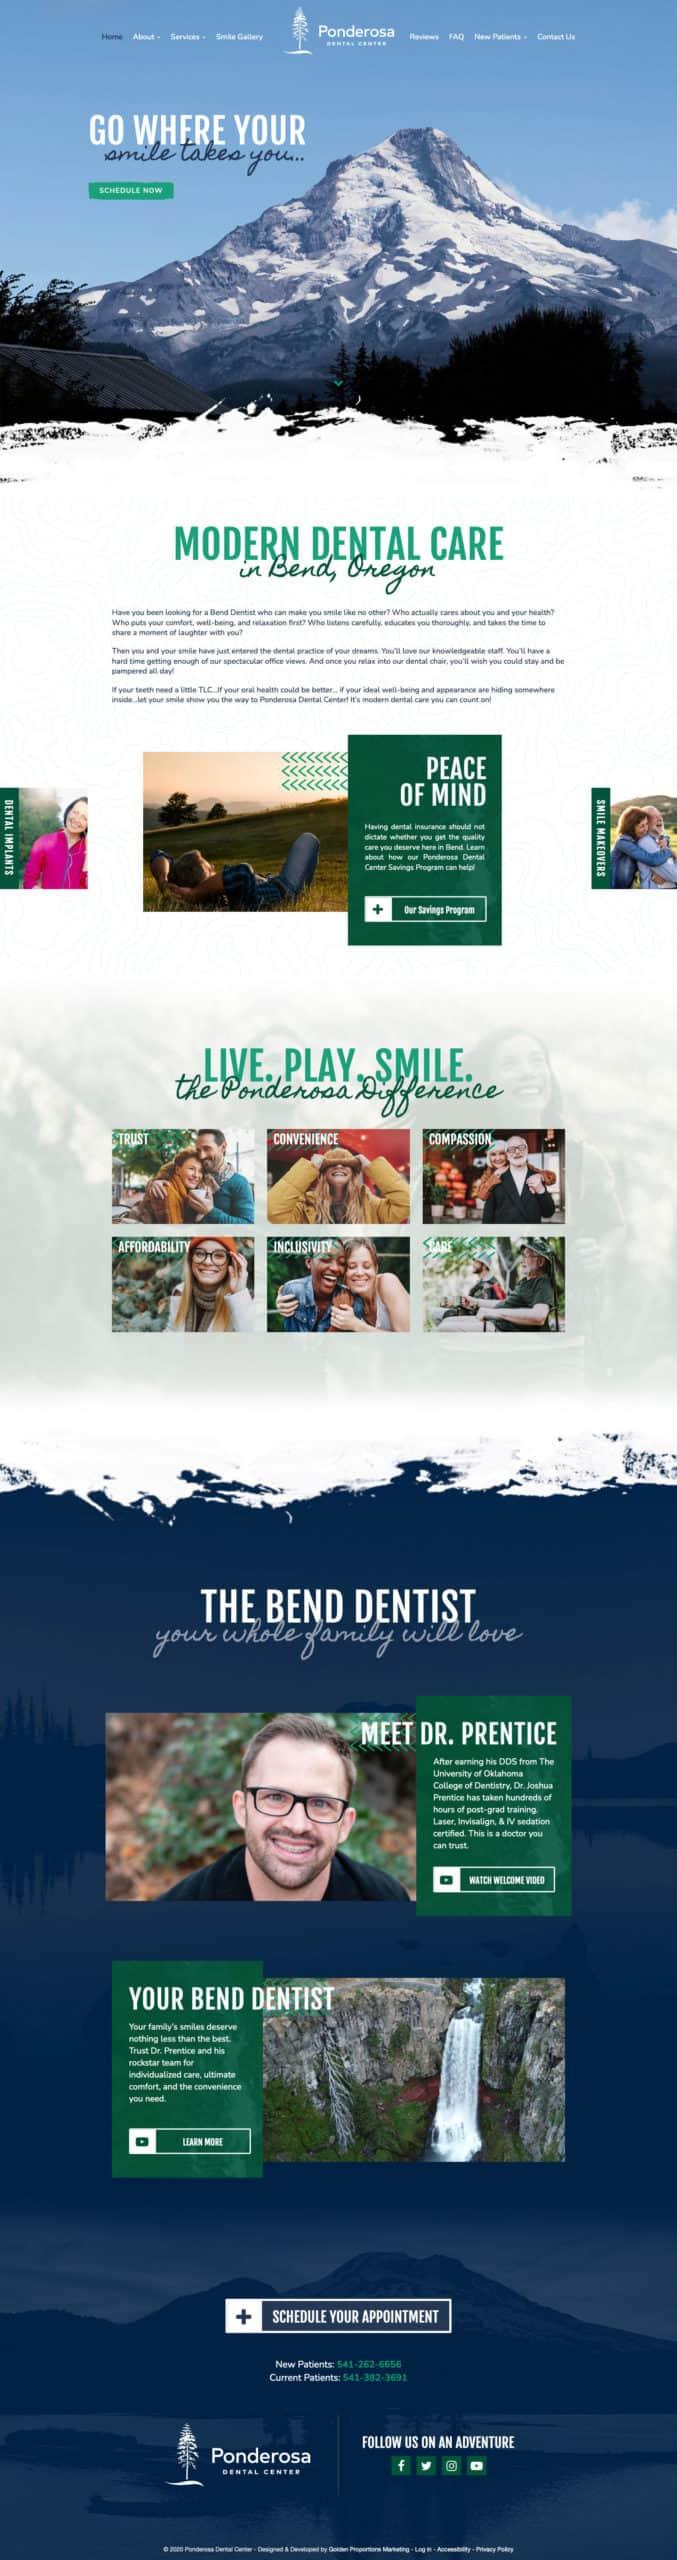 Ponderosa Dental Center